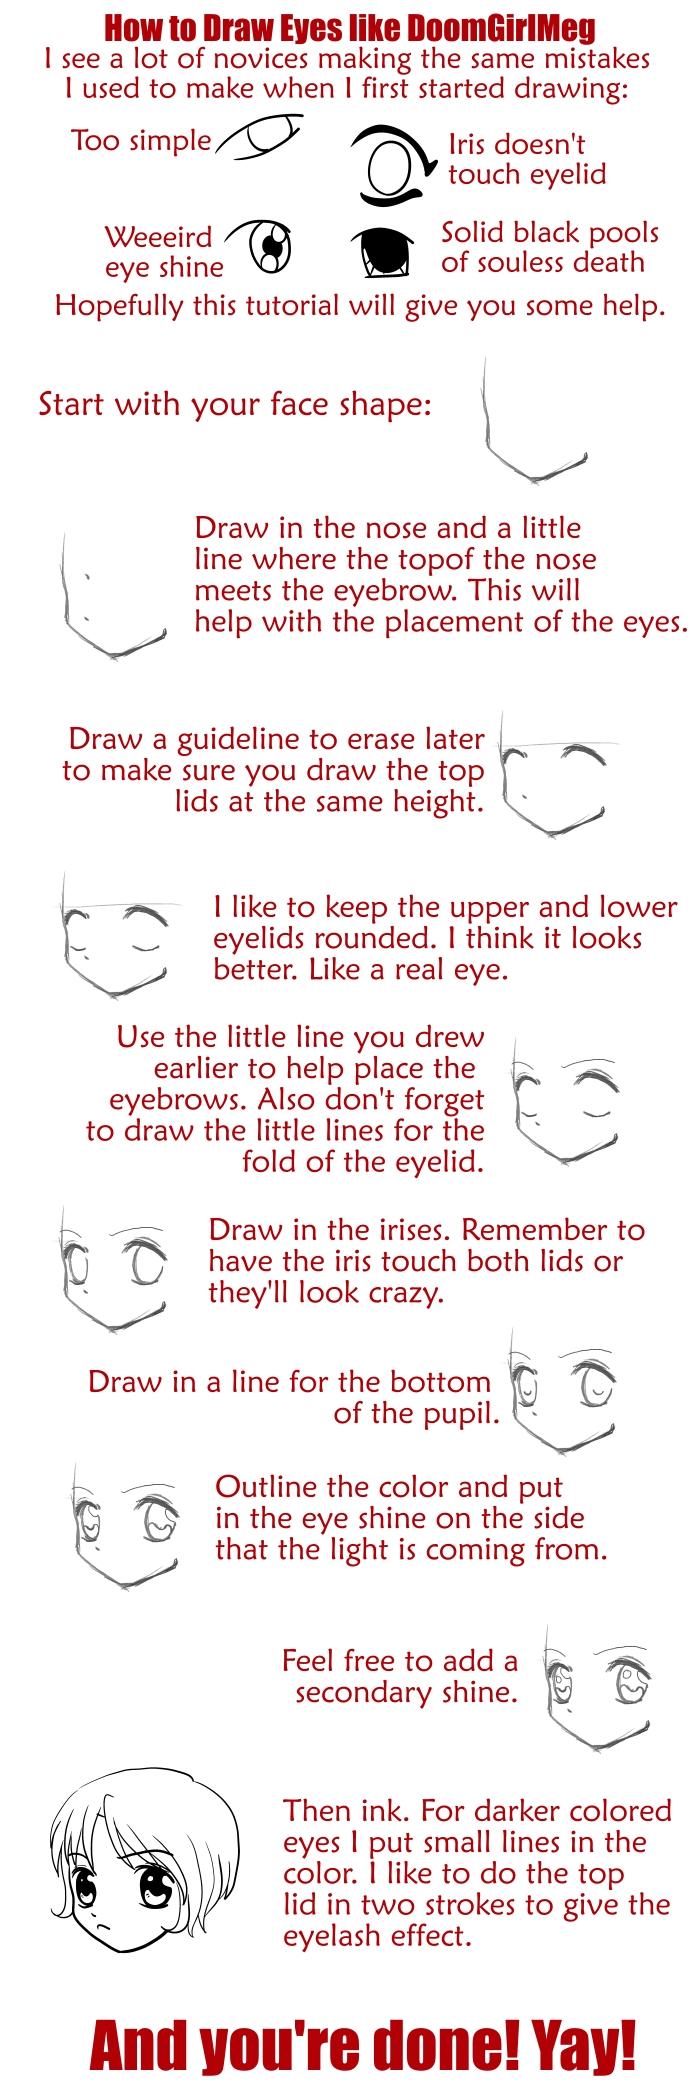 How to Draw Eyes like DGM by DoomGirlMeg